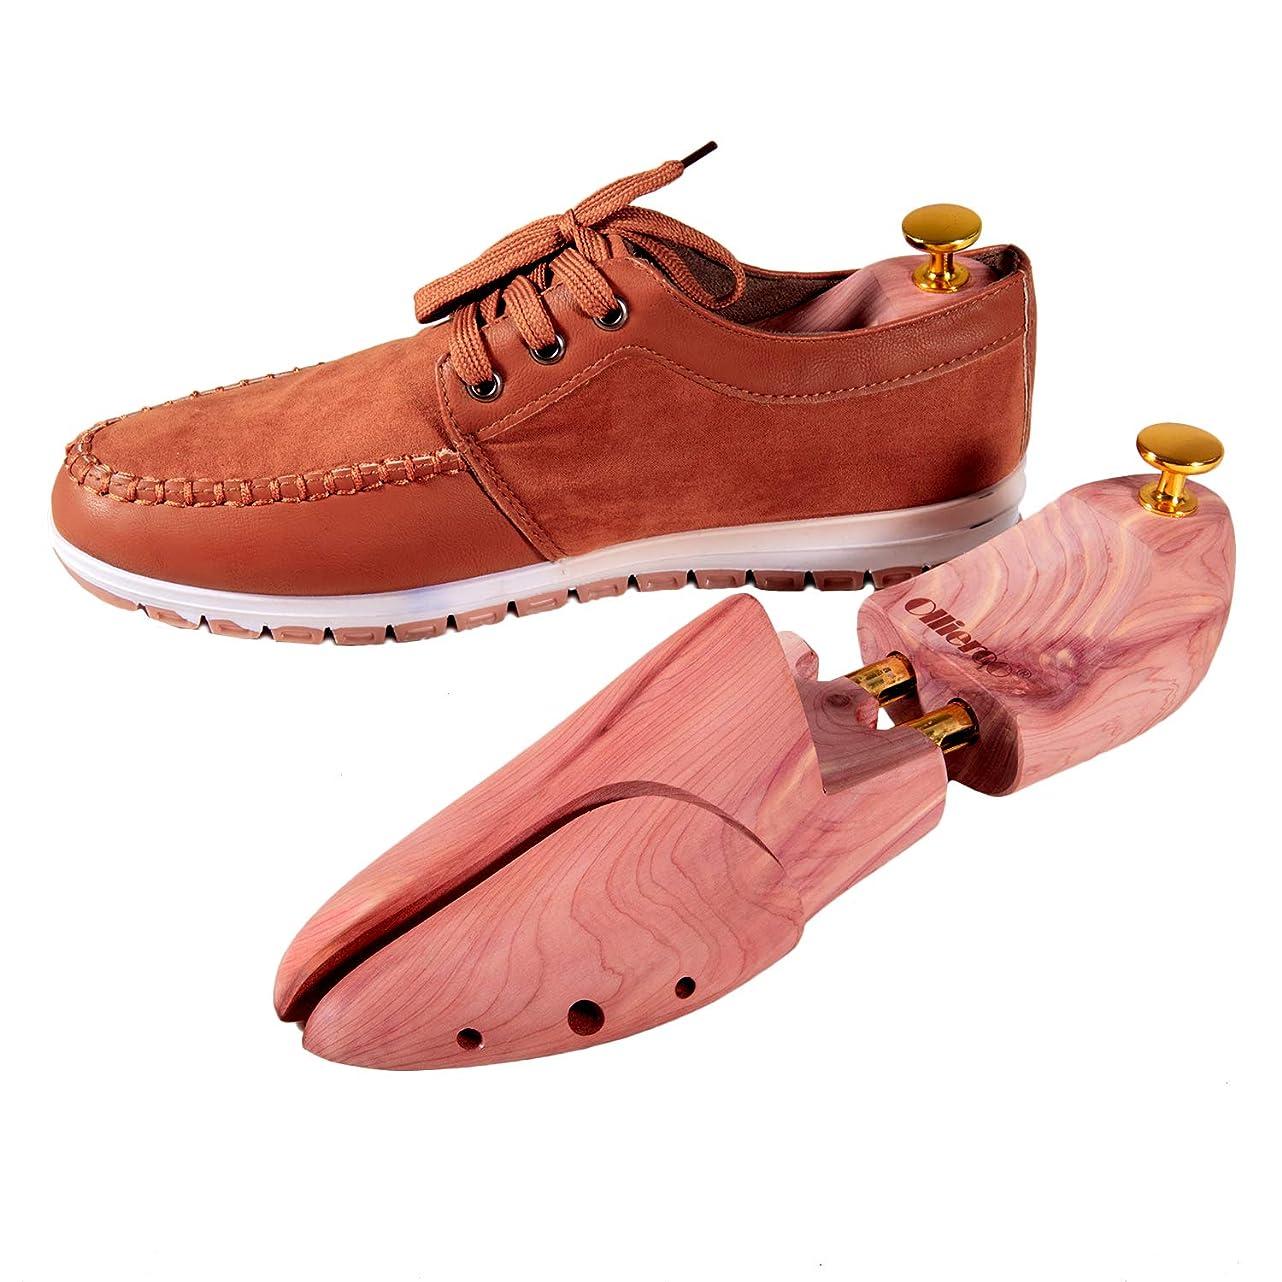 Olive Cedar Shoe Trees Dual Tube Split Toe Adjustable Shoe Stretcher for Men woo191632461820